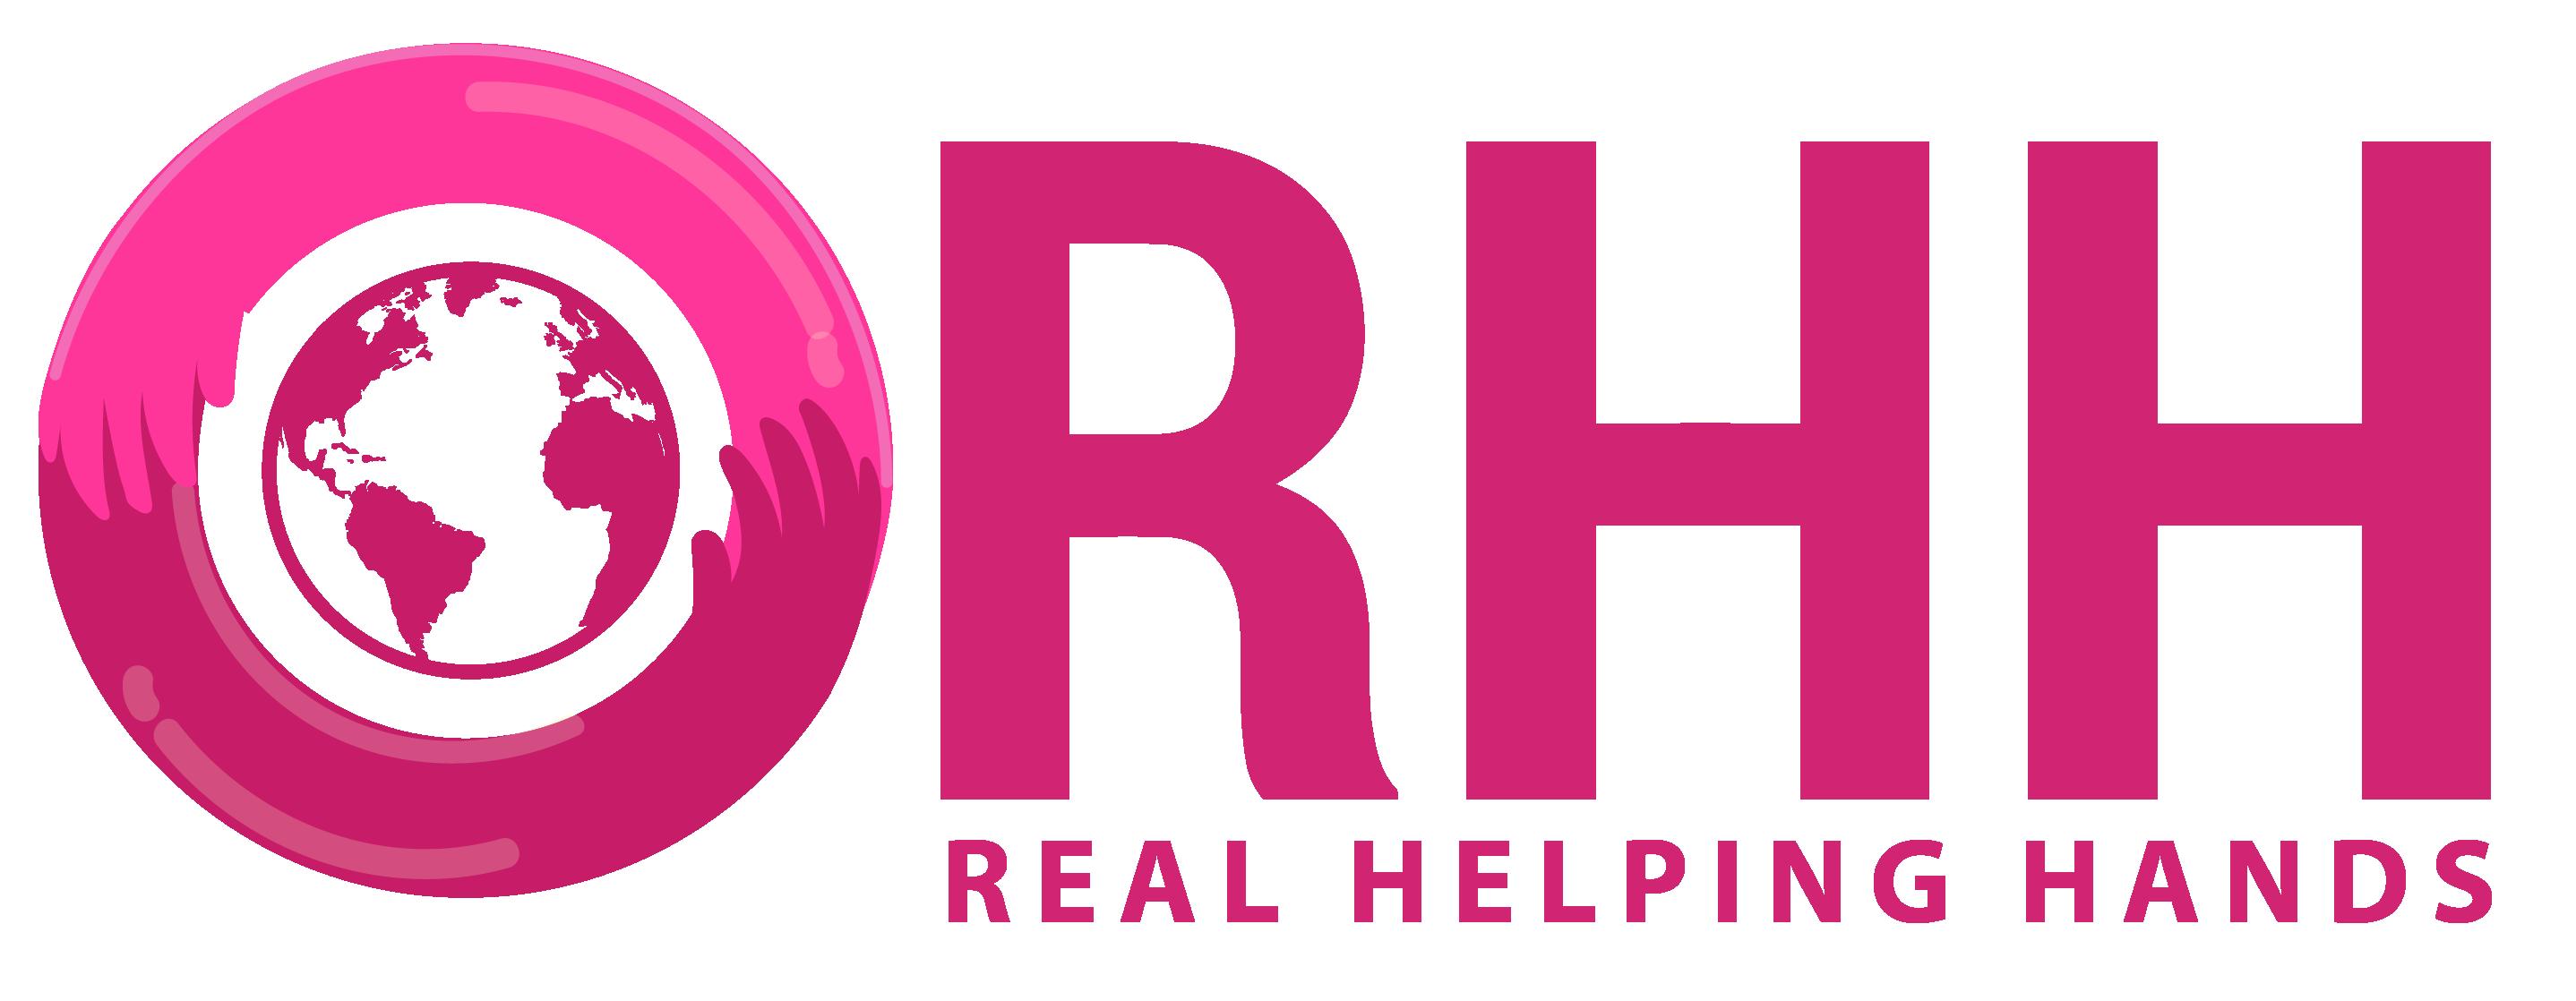 RHH - A Caribbean fundraising platform for crowdfunding